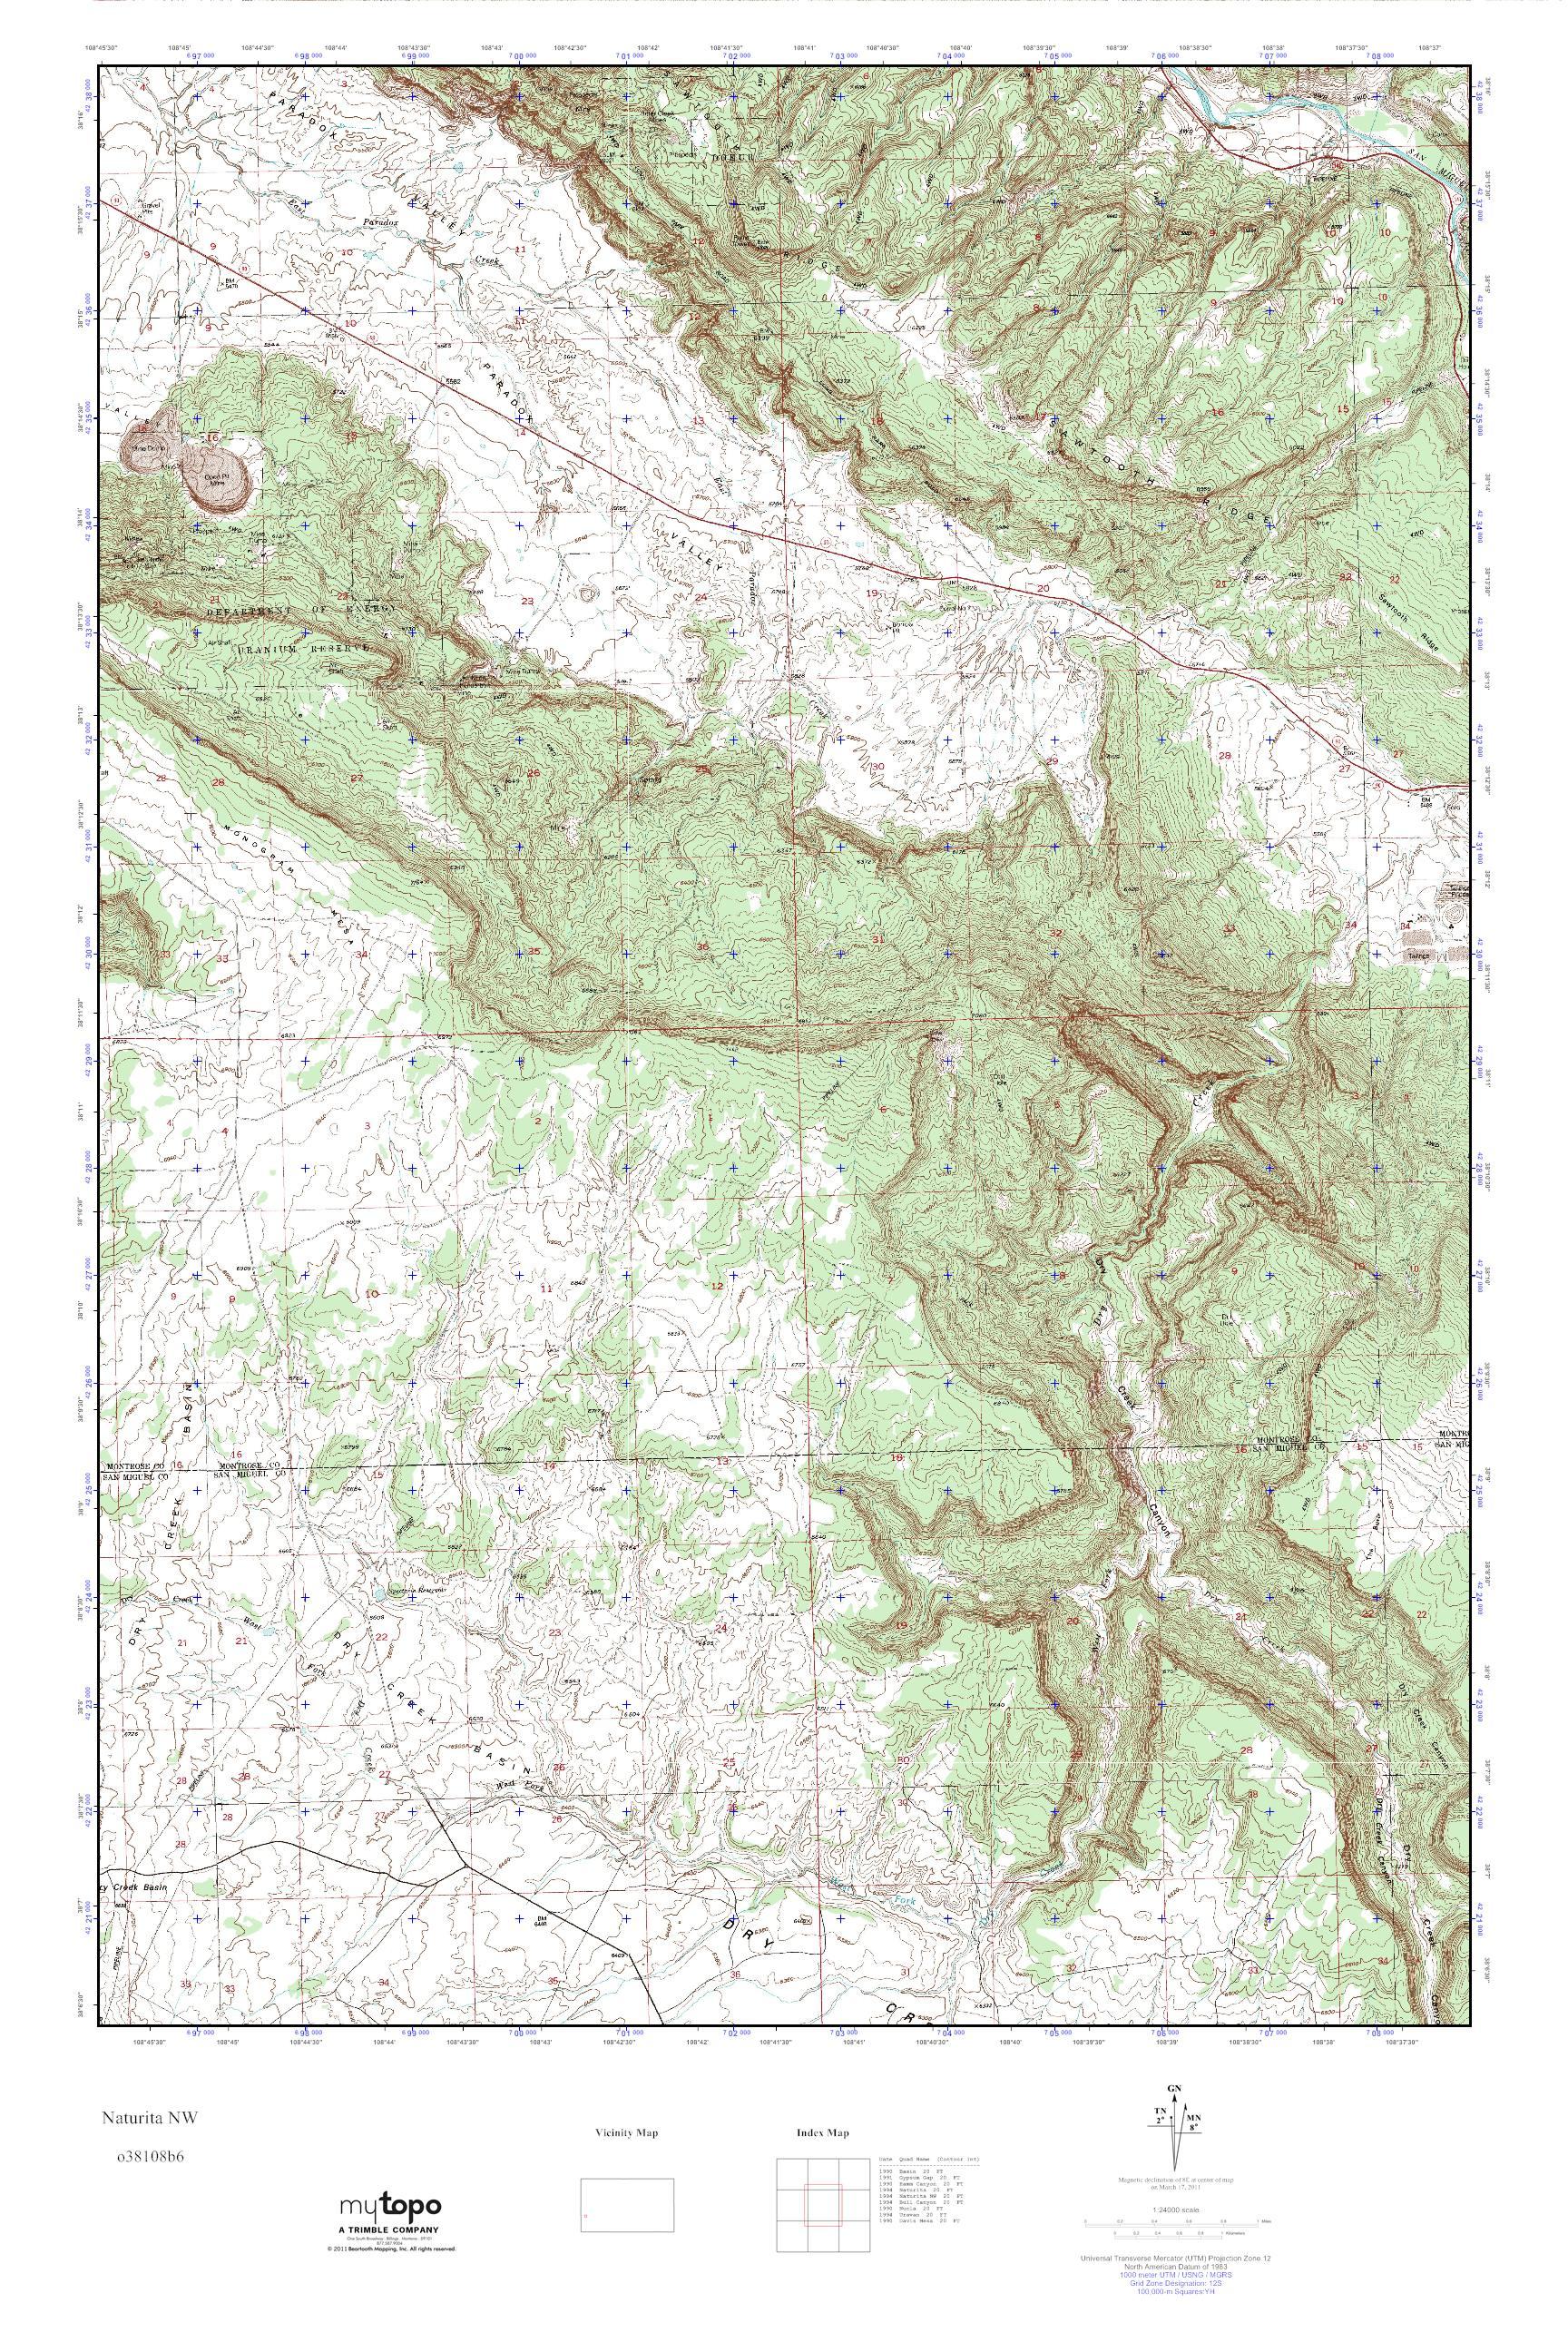 Nw Colorado Map.Mytopo Naturita Nw Colorado Usgs Quad Topo Map